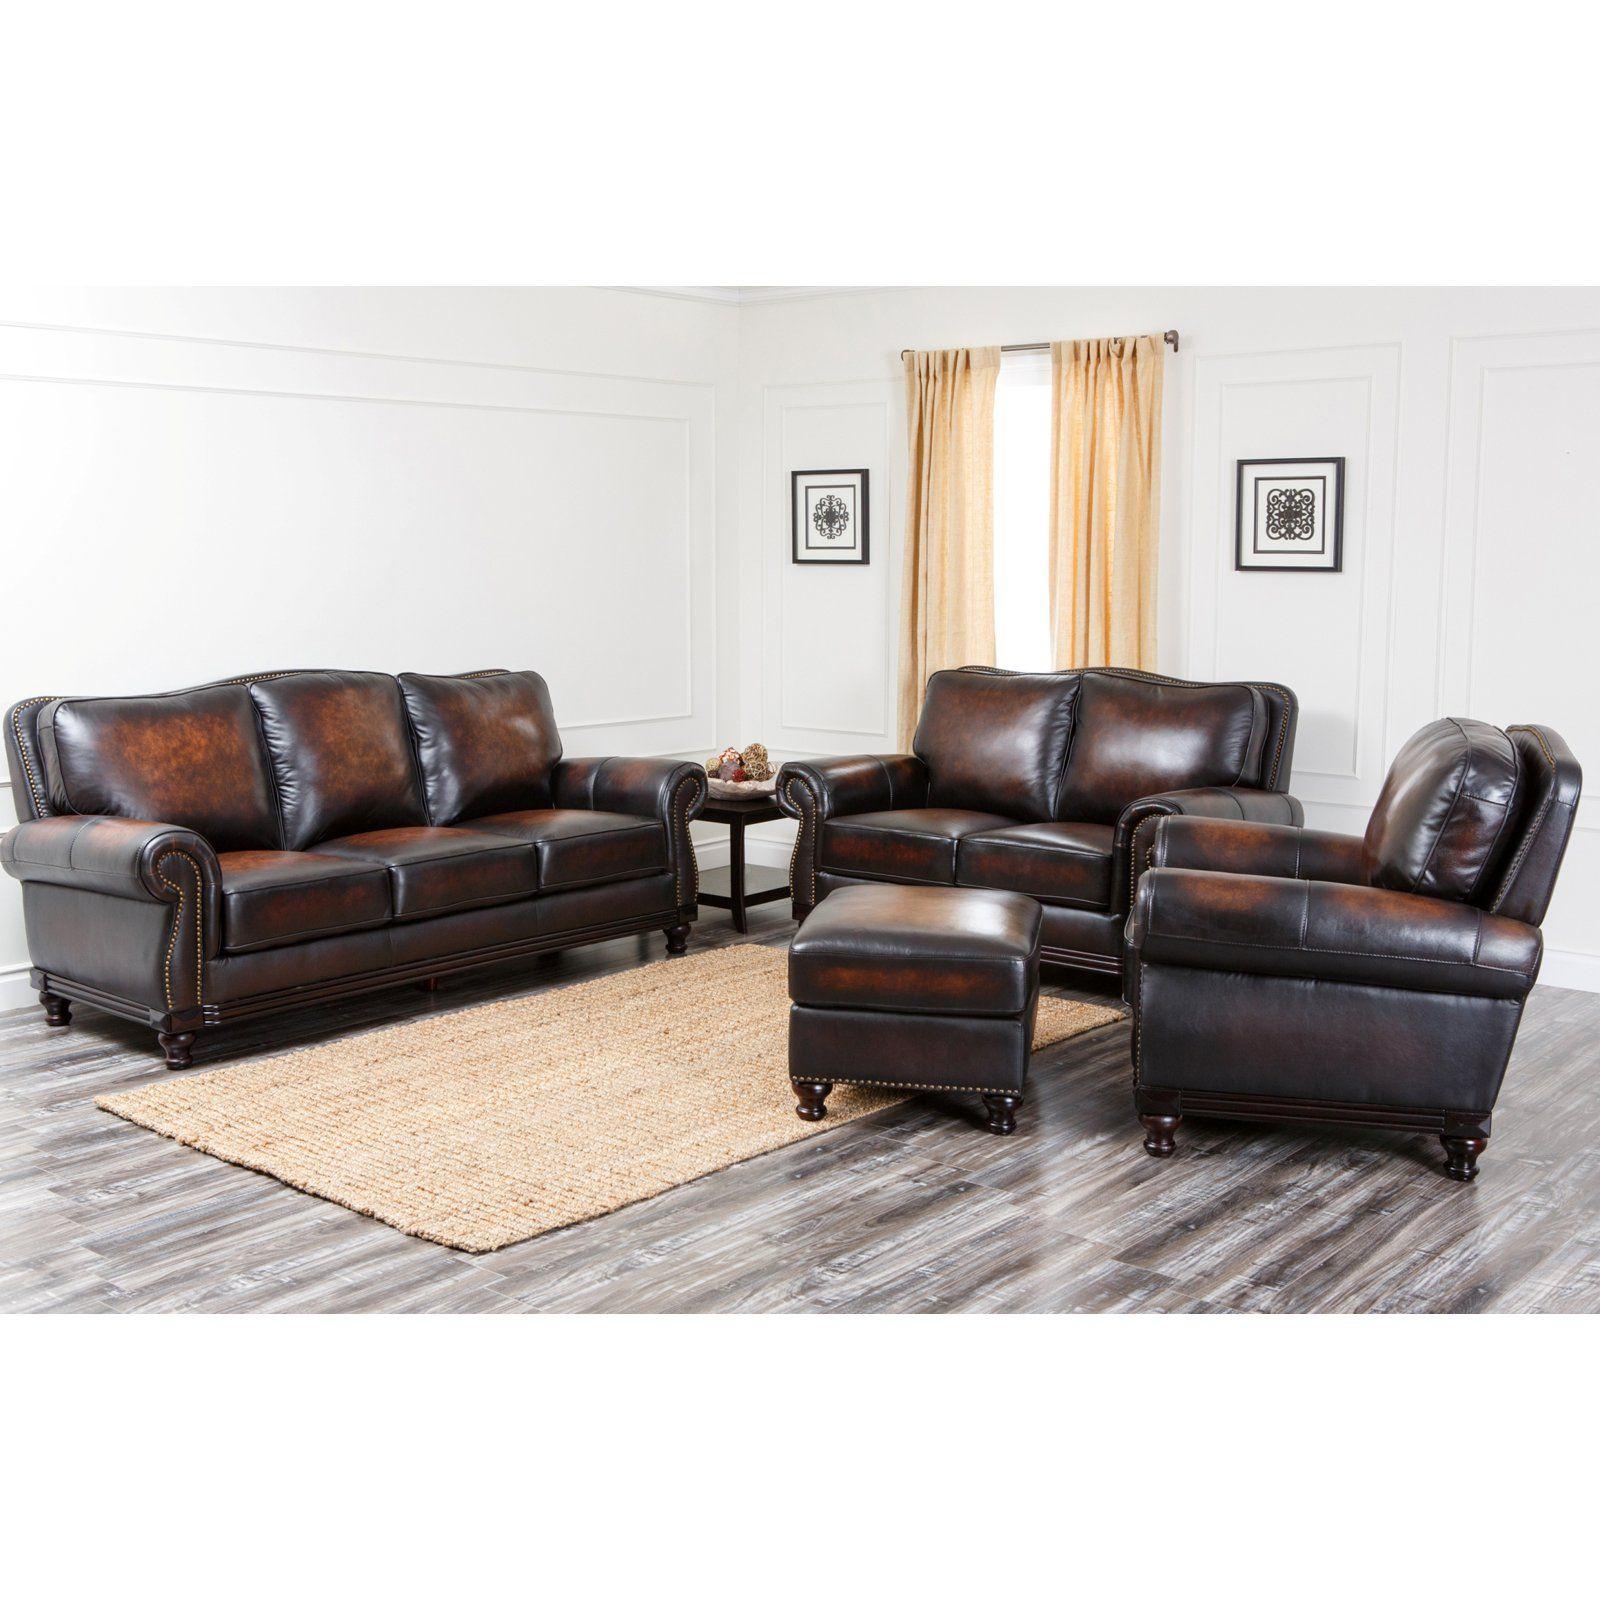 Pardon Our Interruption Abbyson Living Leather Sofa Set Luxury Sofa Modern